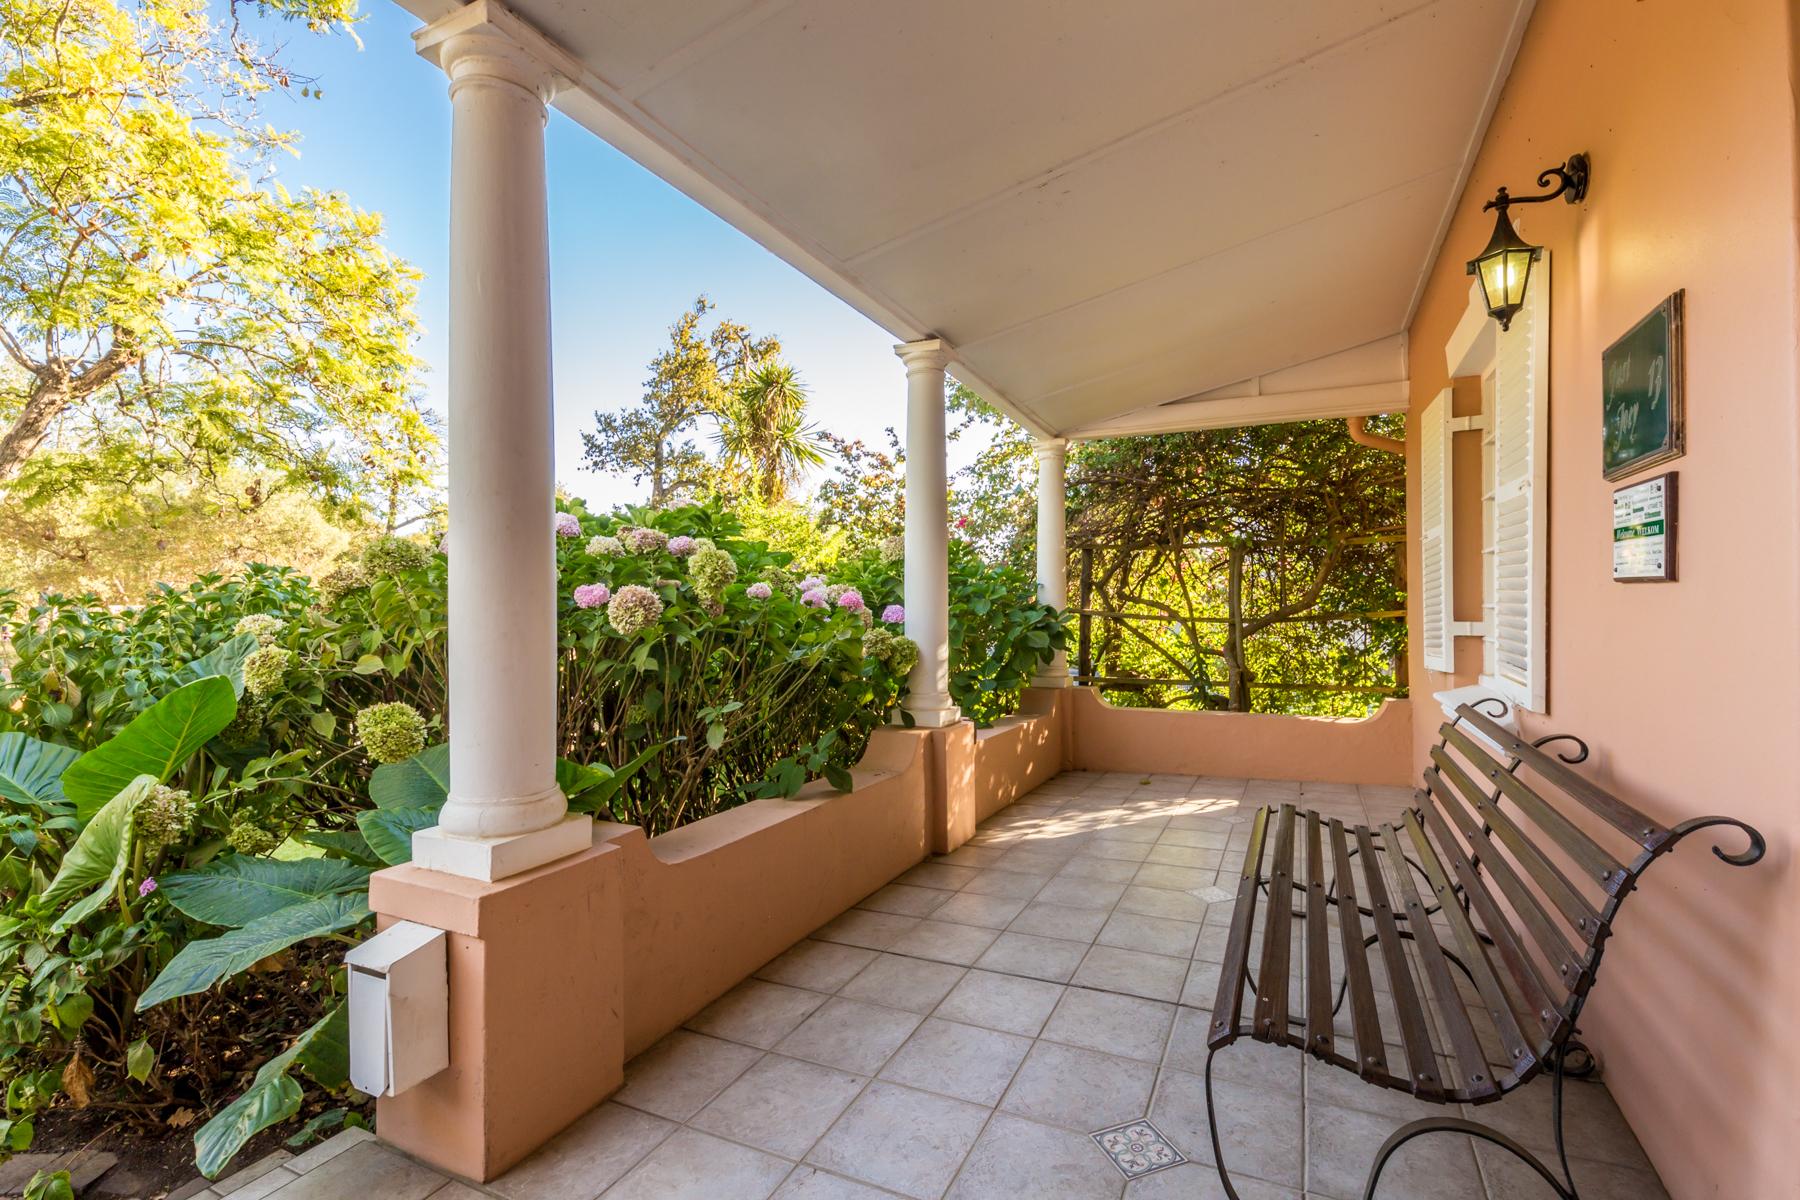 واحد منزل الأسرة للـ Sale في Stellenbosch Guest House Stellenbosch, Western Cape, 7600 South Africa